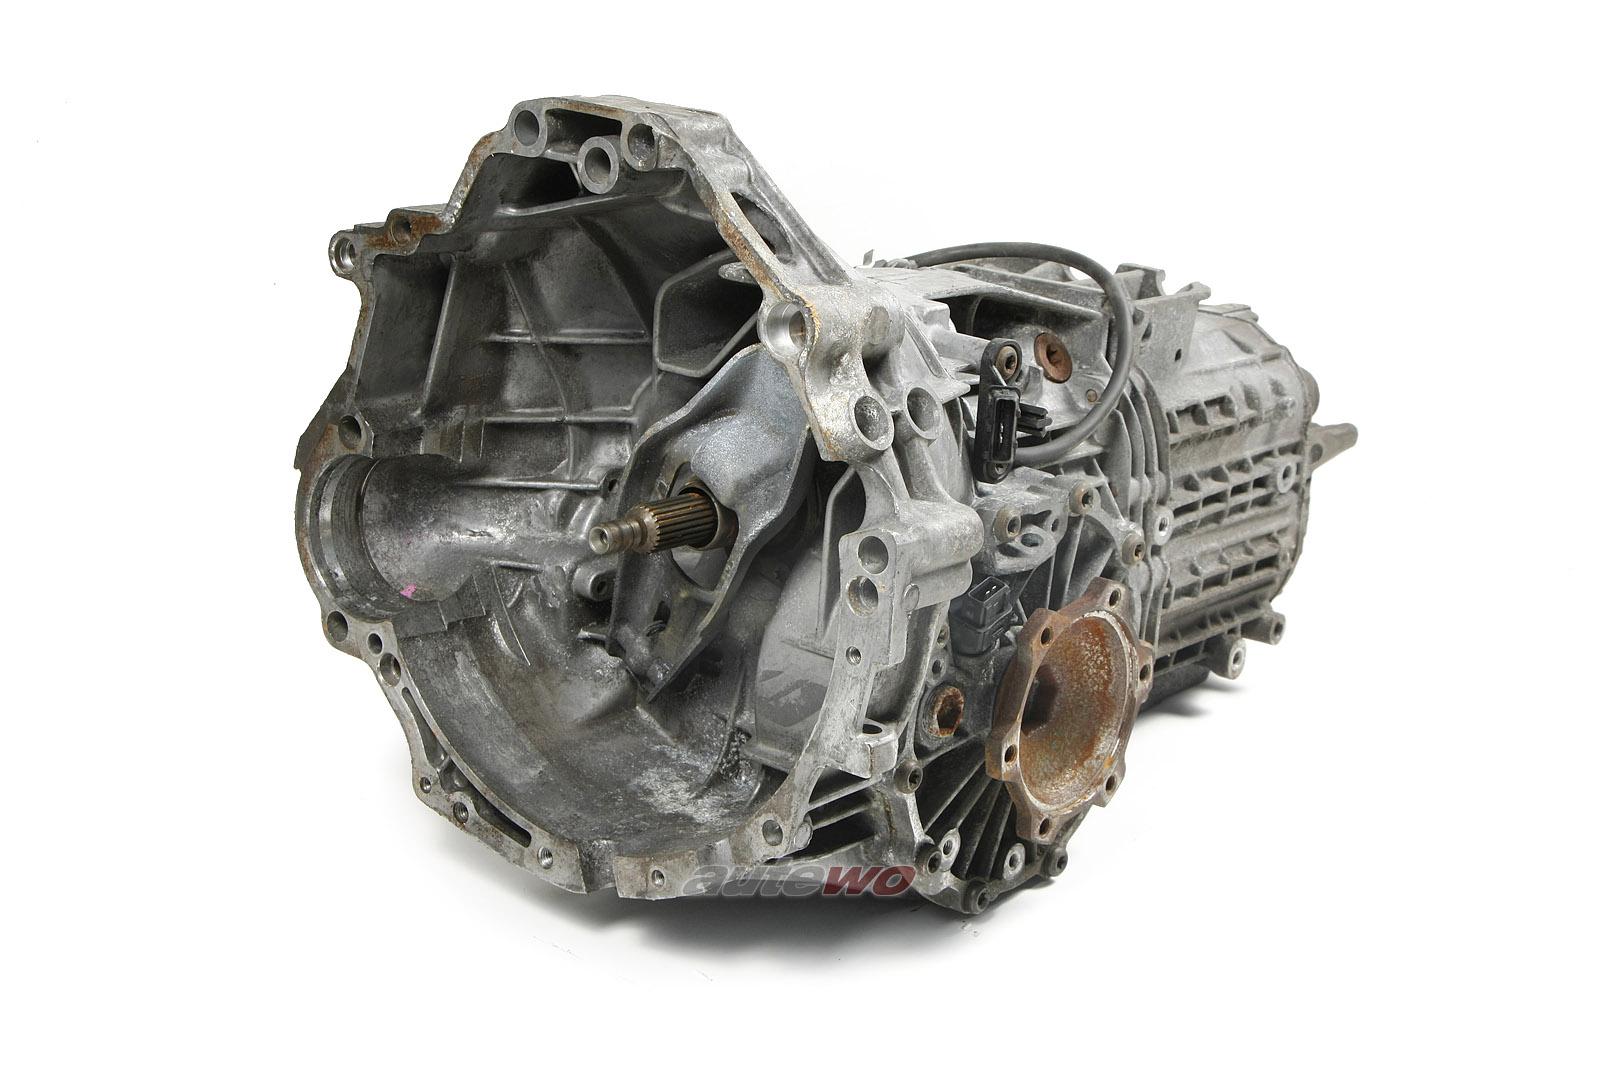 012300048FX Audi 80 B4/Coupe/Cabrio Typ 89/A6 C4 2.6l Getriebe 5-Gang CPE 17124